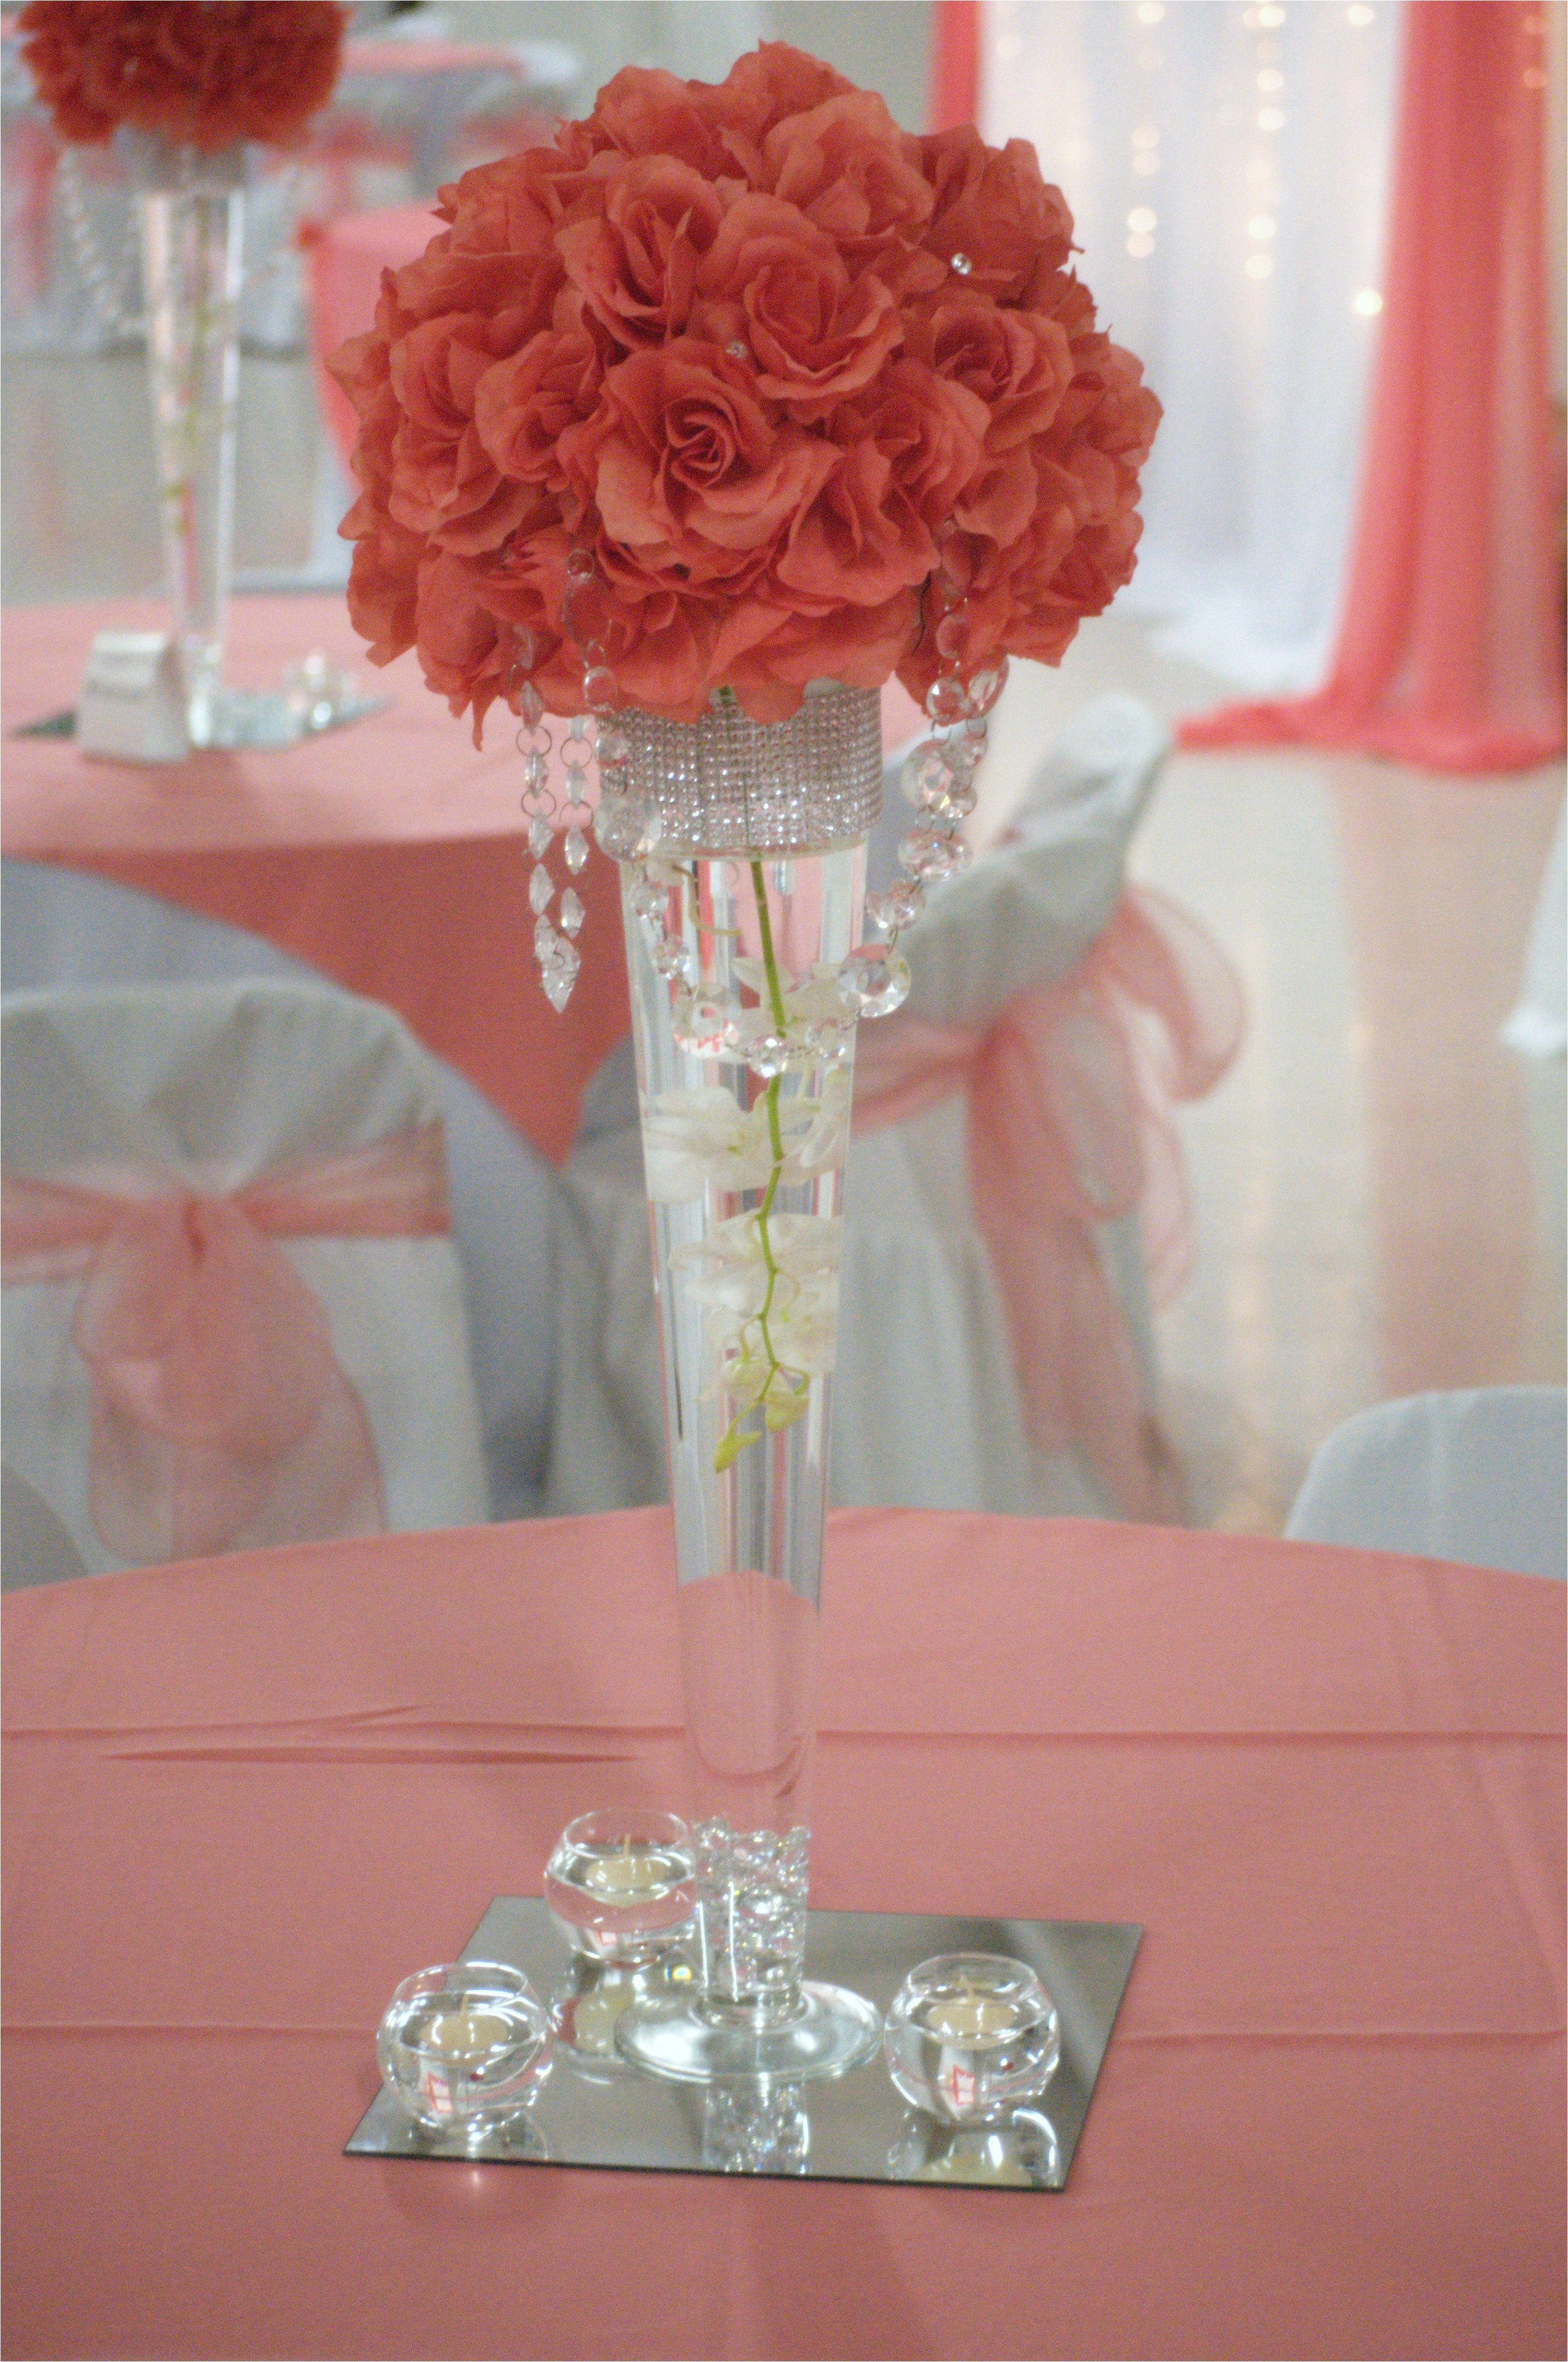 centros de mesa de cristal a wedding centerpieces coral wedding but with silver branchs coming out of the top of the